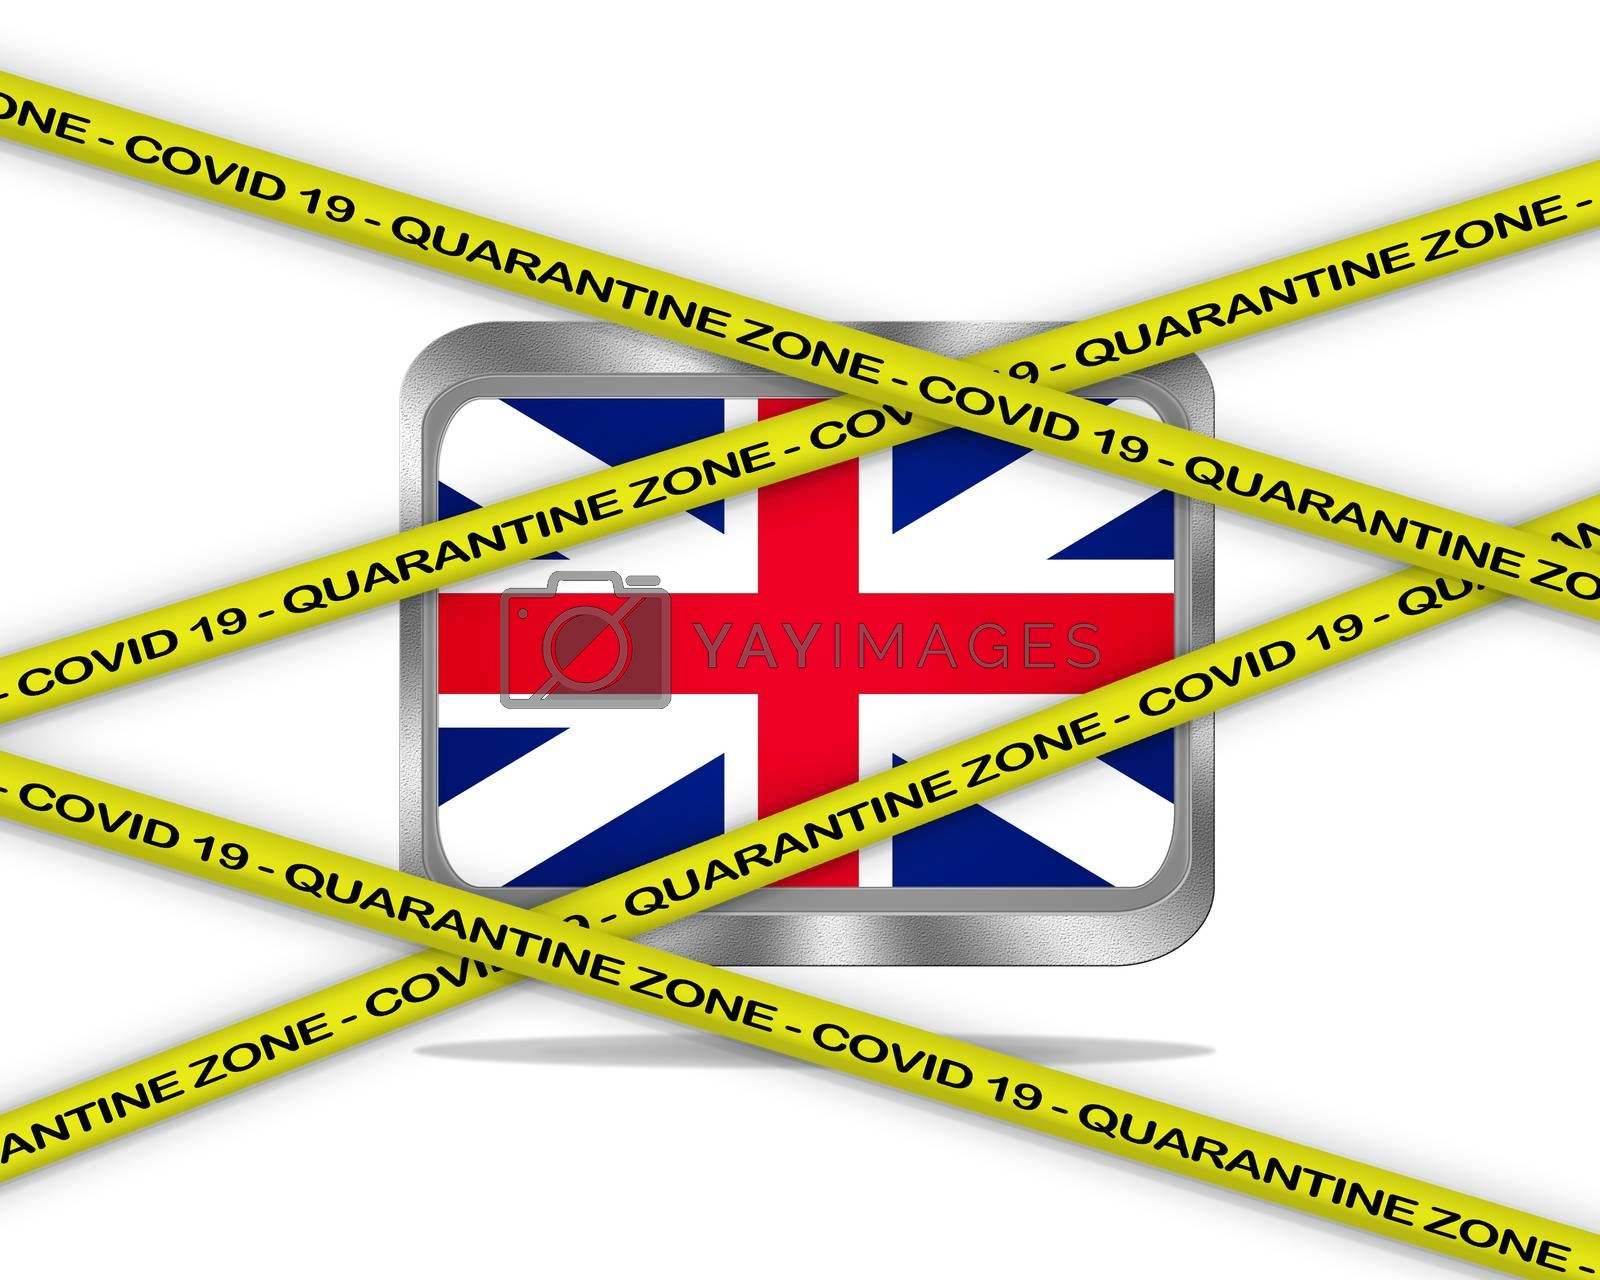 COVID-19 warning yellow ribbon written with: Quarantine zone Cover 19 on United Kingdom flag illustration. Coronavirus danger area, quarantined country.